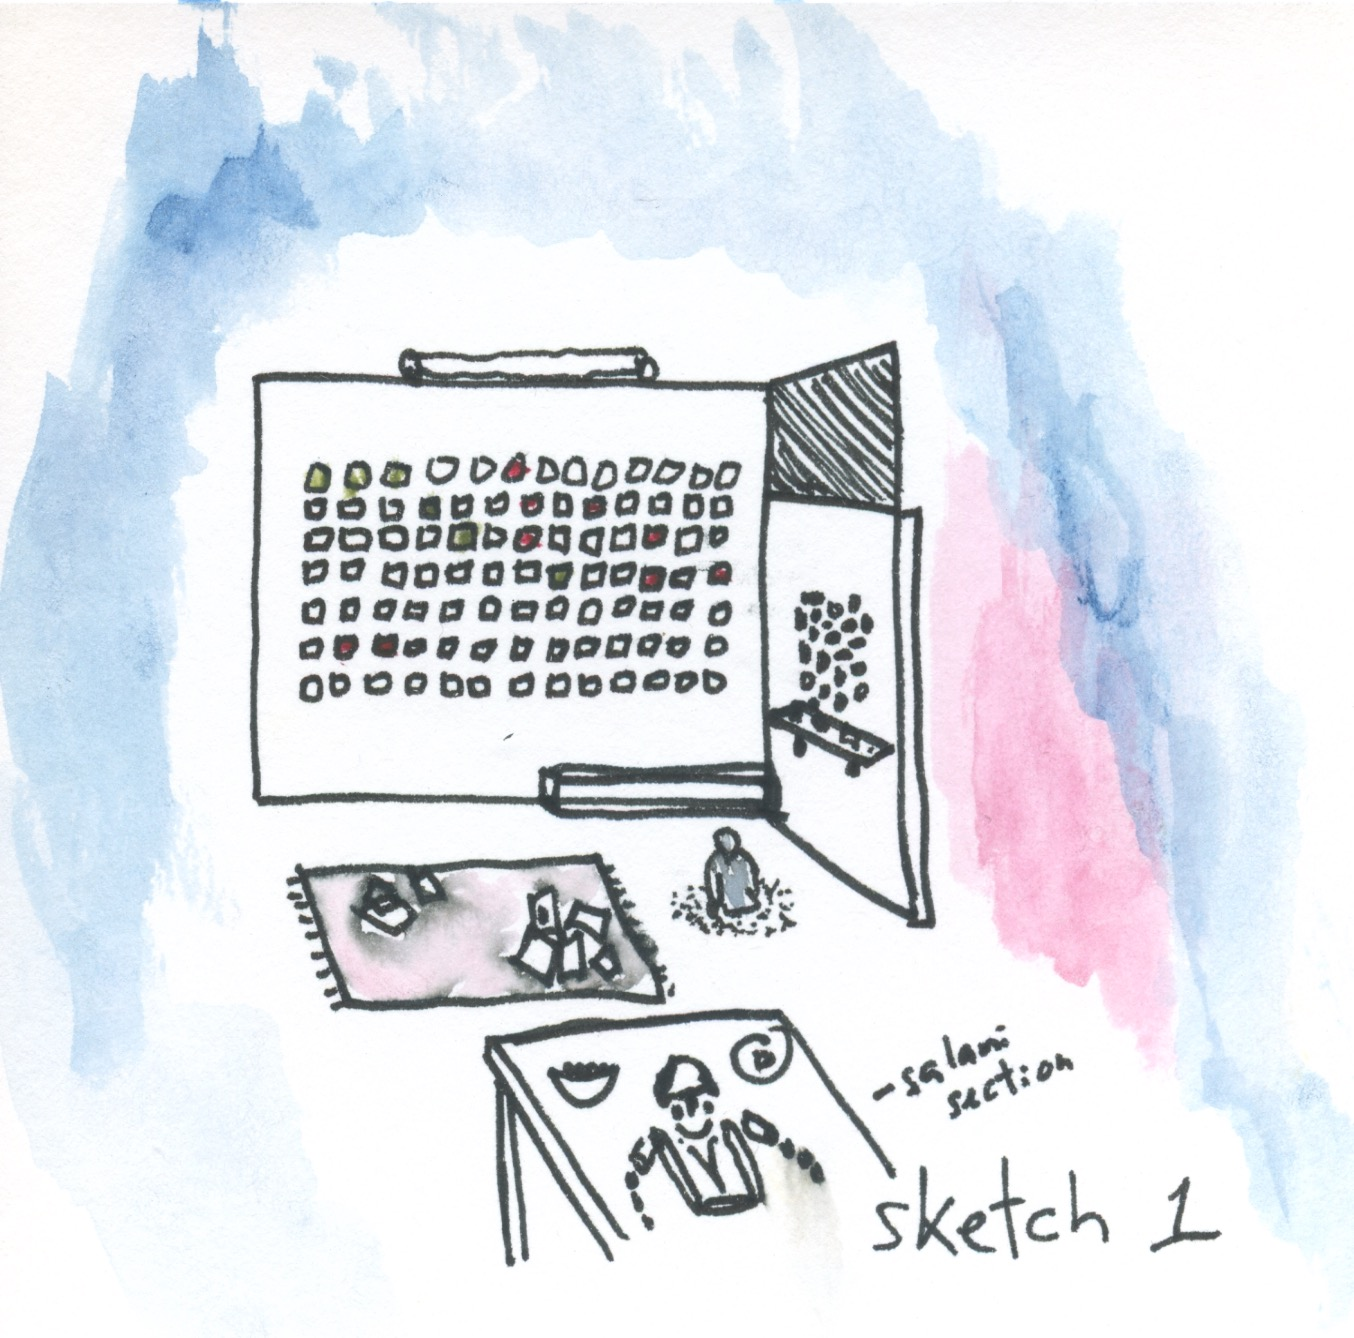 Sketch 1 in pantone colors